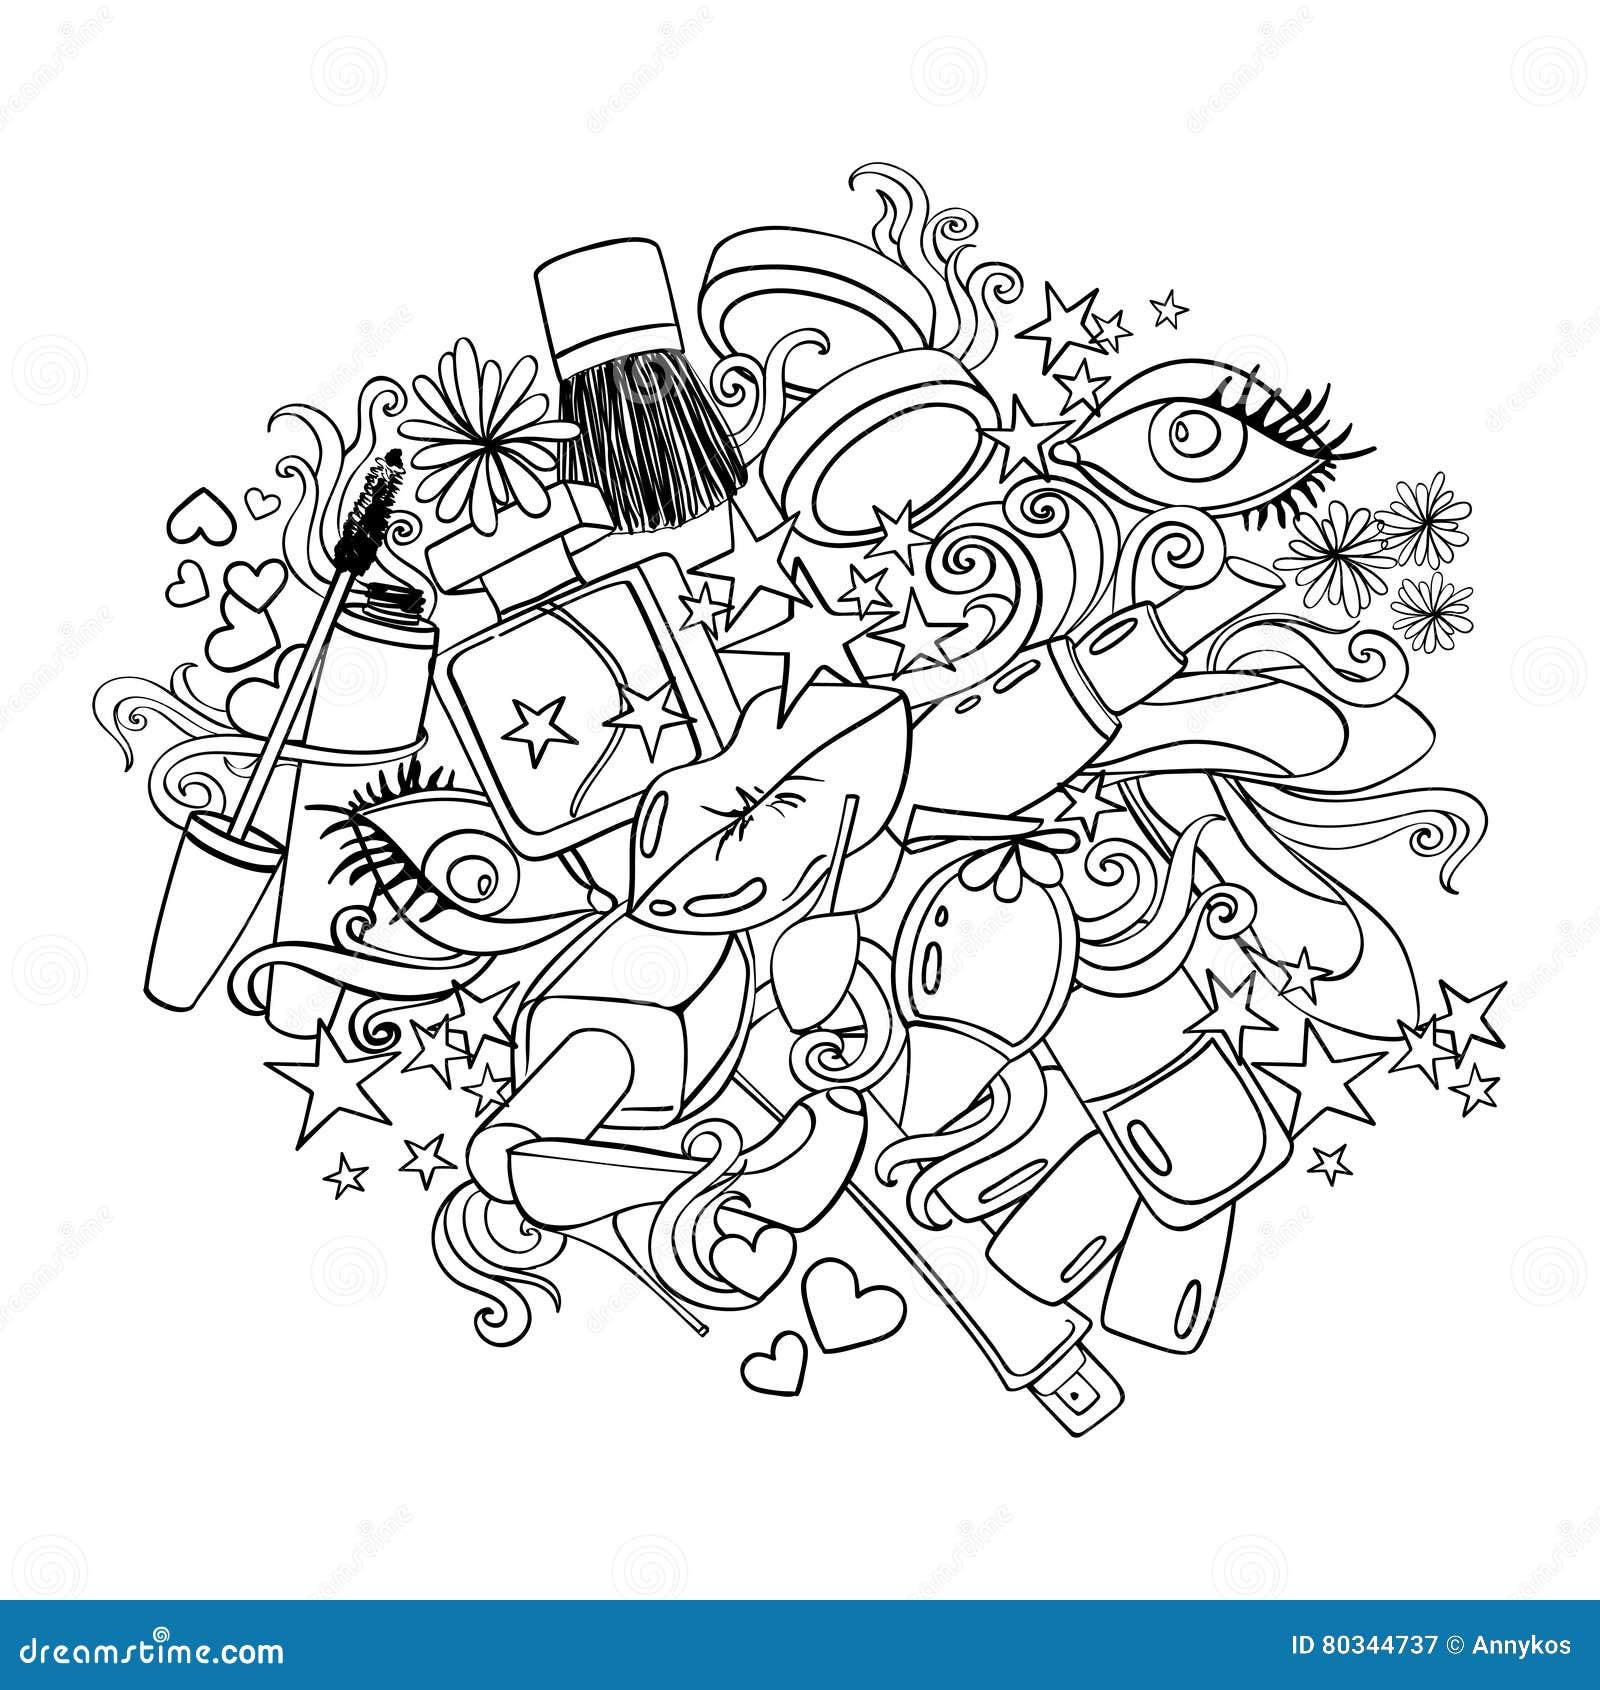 Sketch Cartoon Illustration With Decorative Cosmetics ...